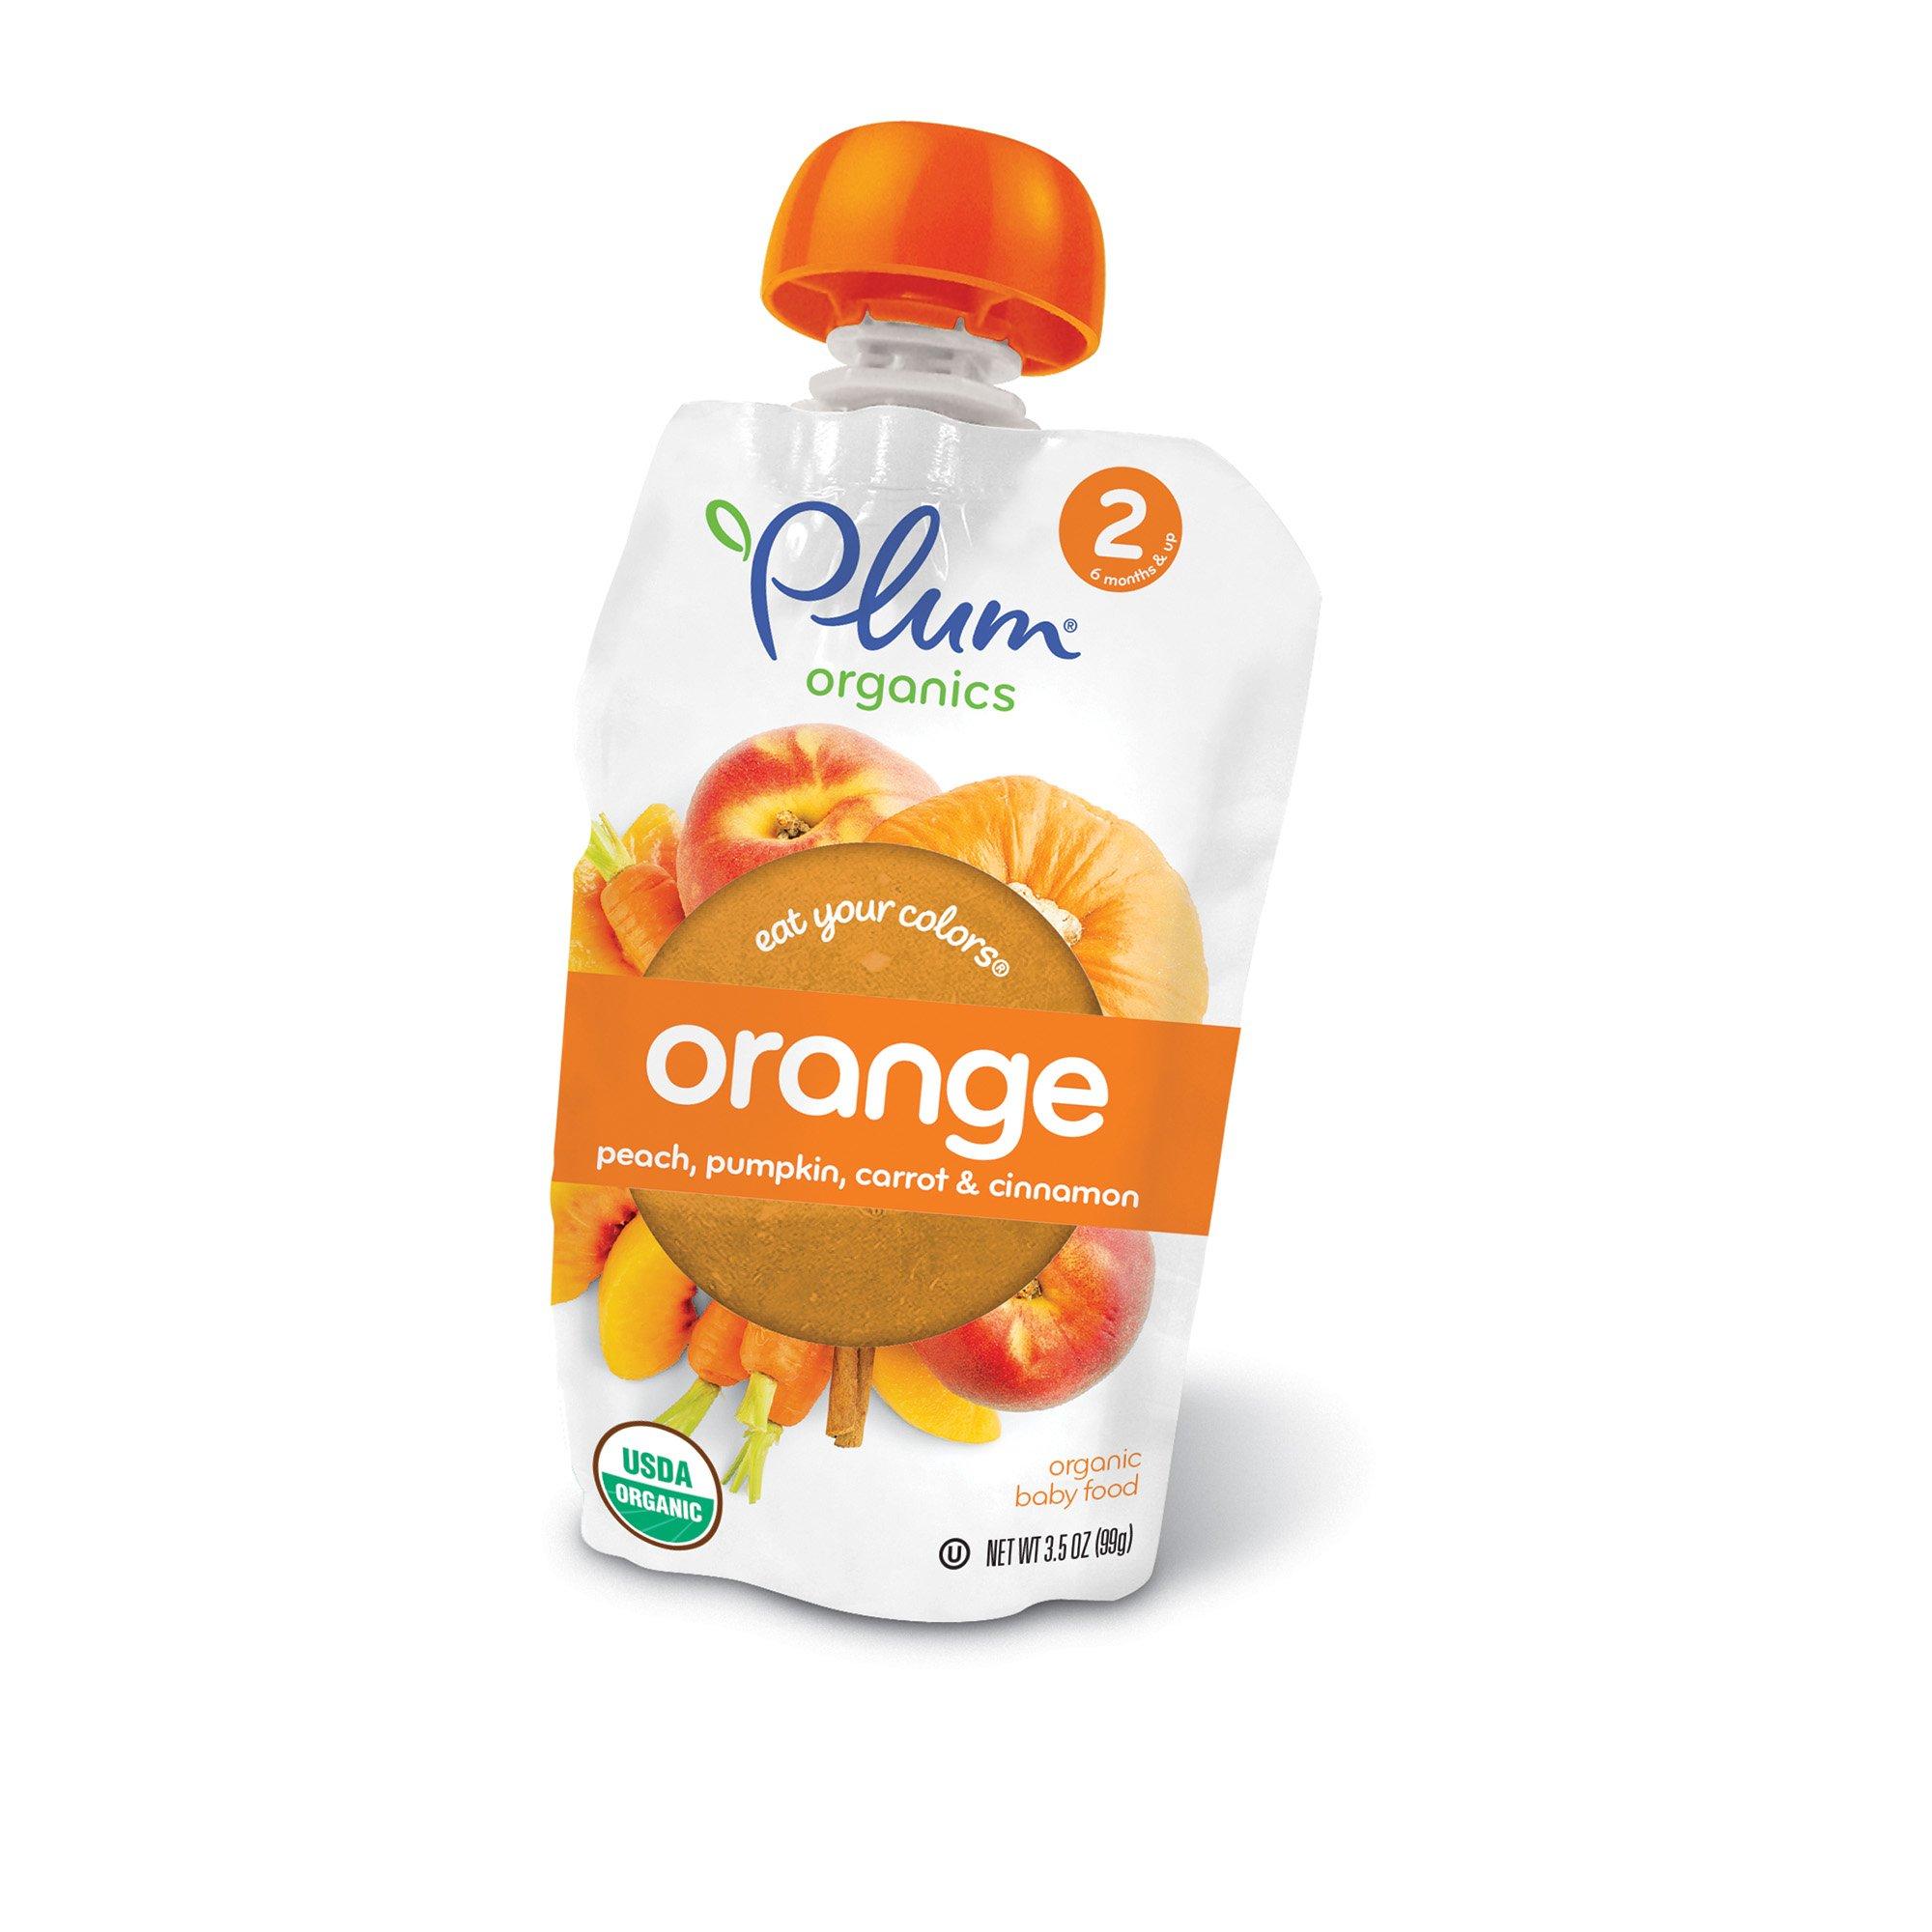 Plum Organics Stage 2 Eat Your Colors Orange, Organic Baby Food, Peach, Pumpkin, Carrot & Cinnamon, 3.5 oz